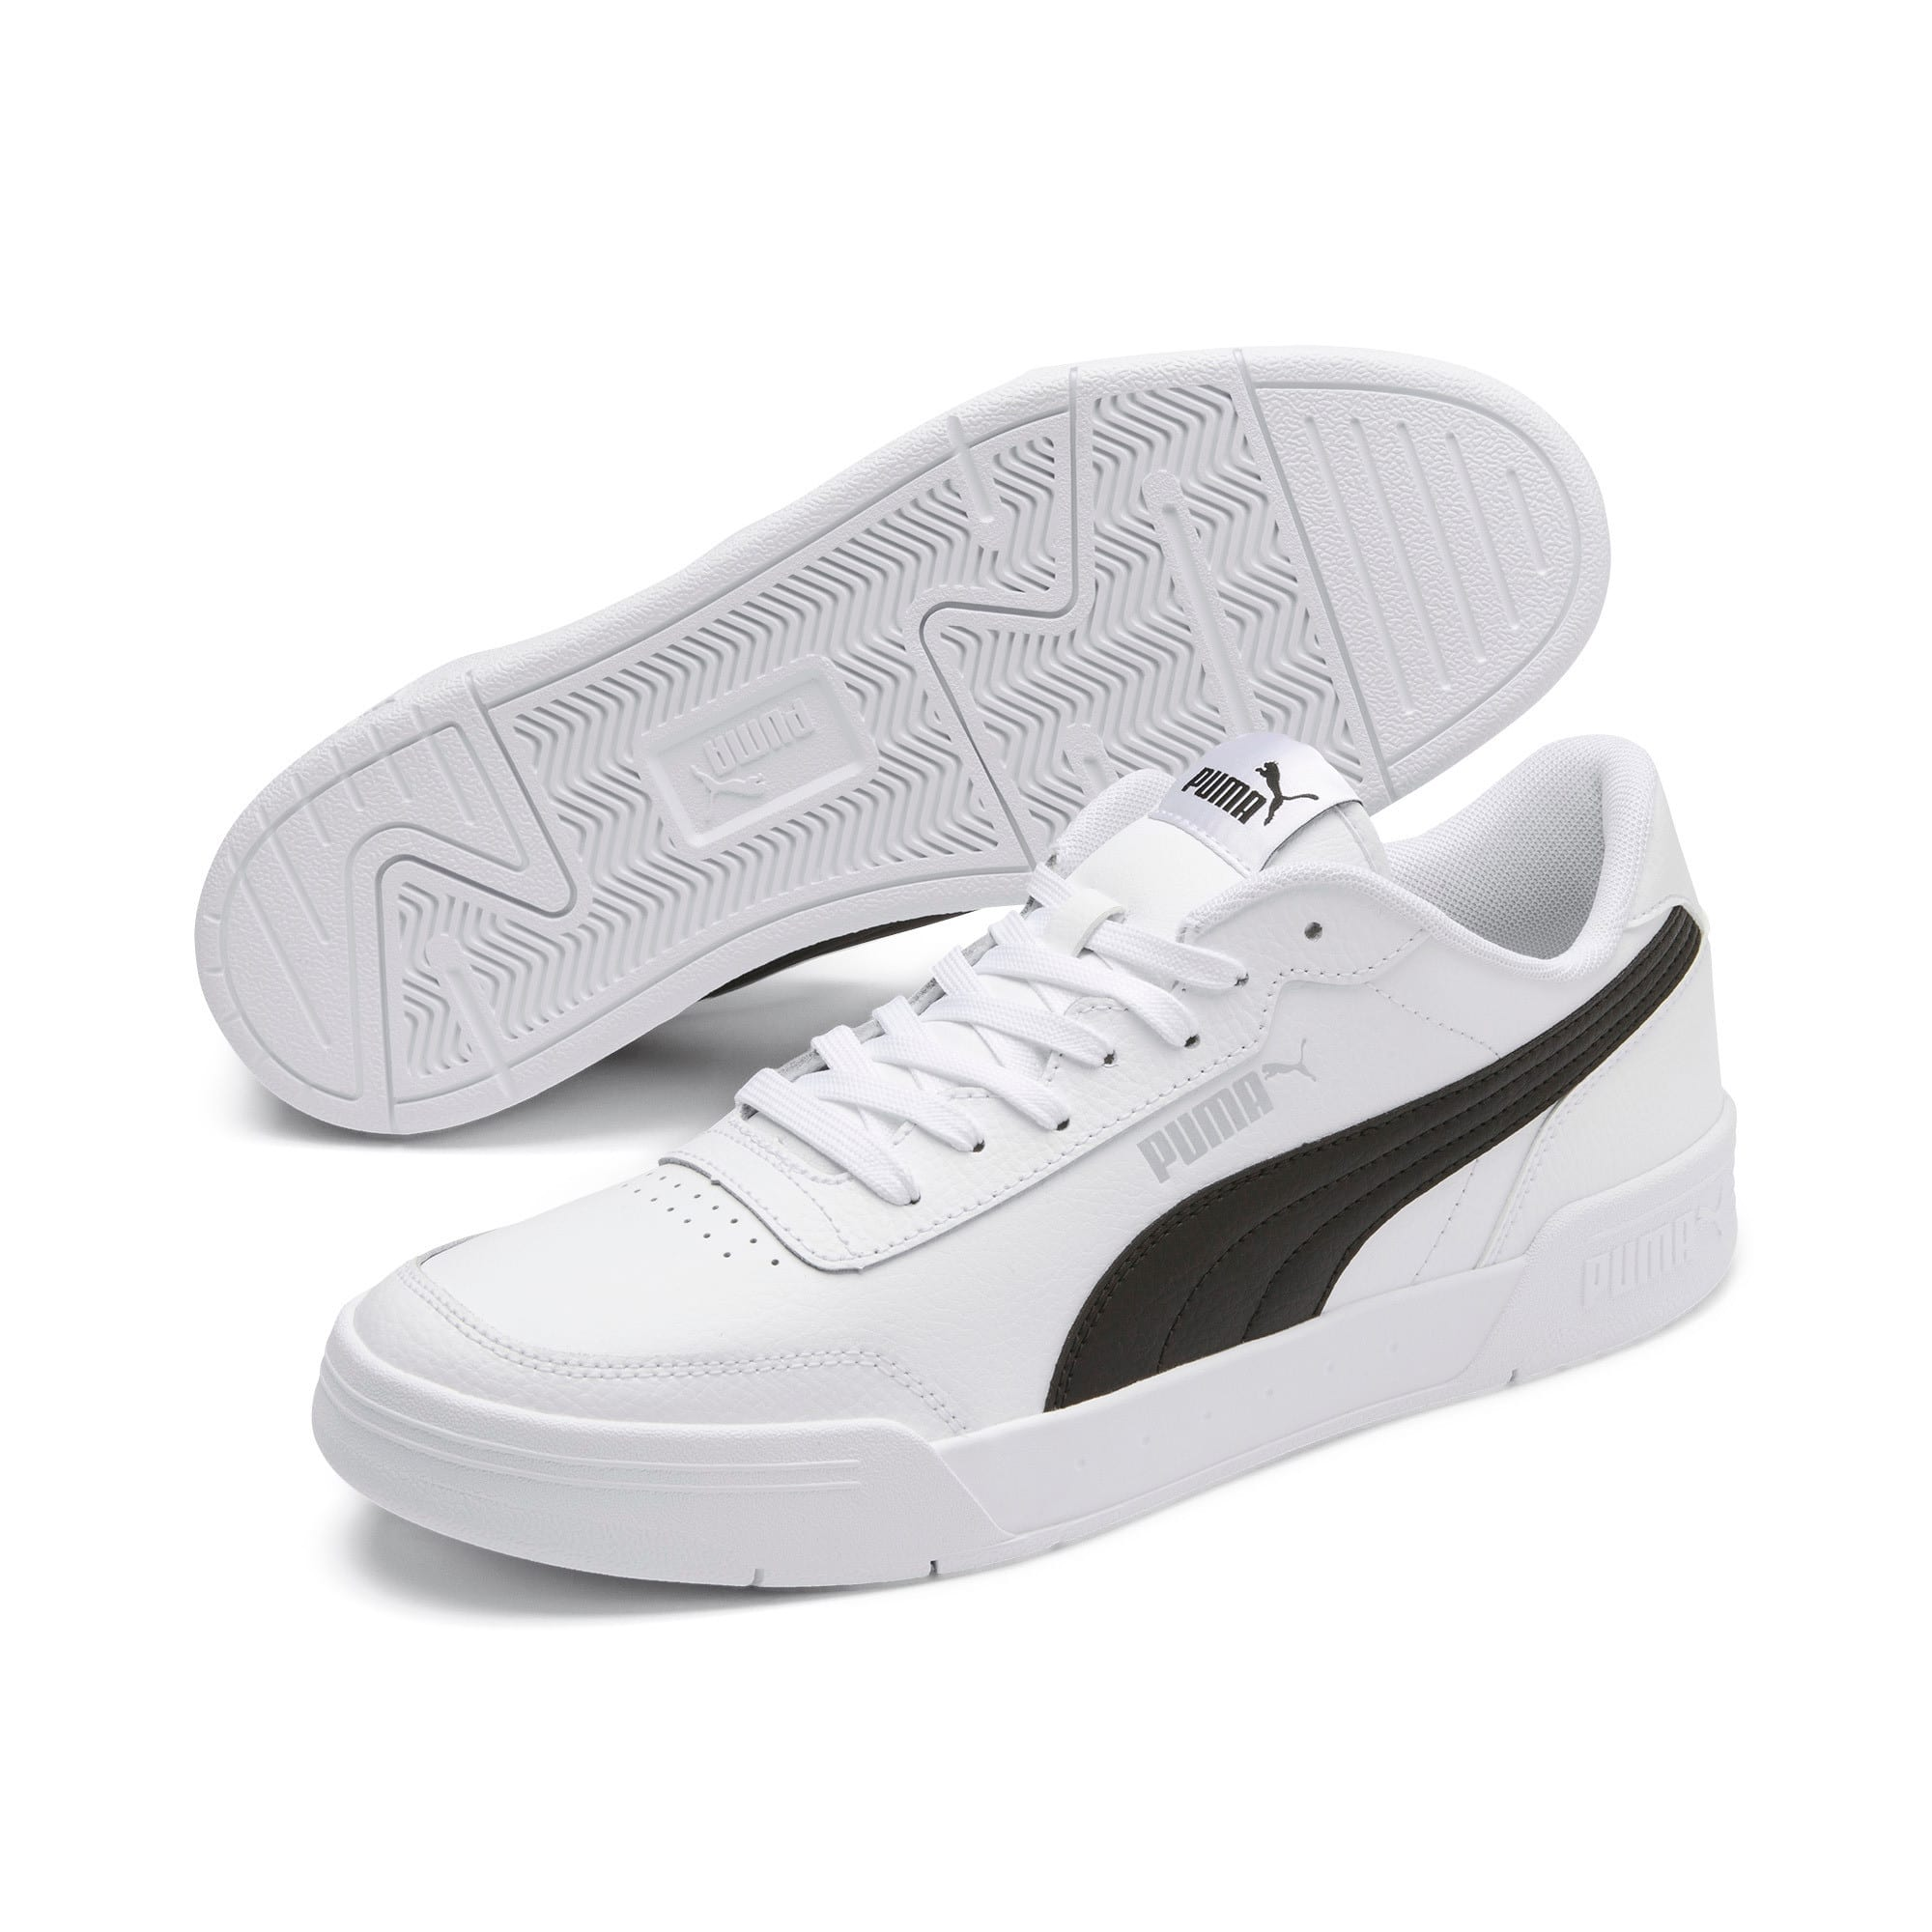 Thumbnail 3 of Caracal Sneakers, Puma White-Puma Black, medium